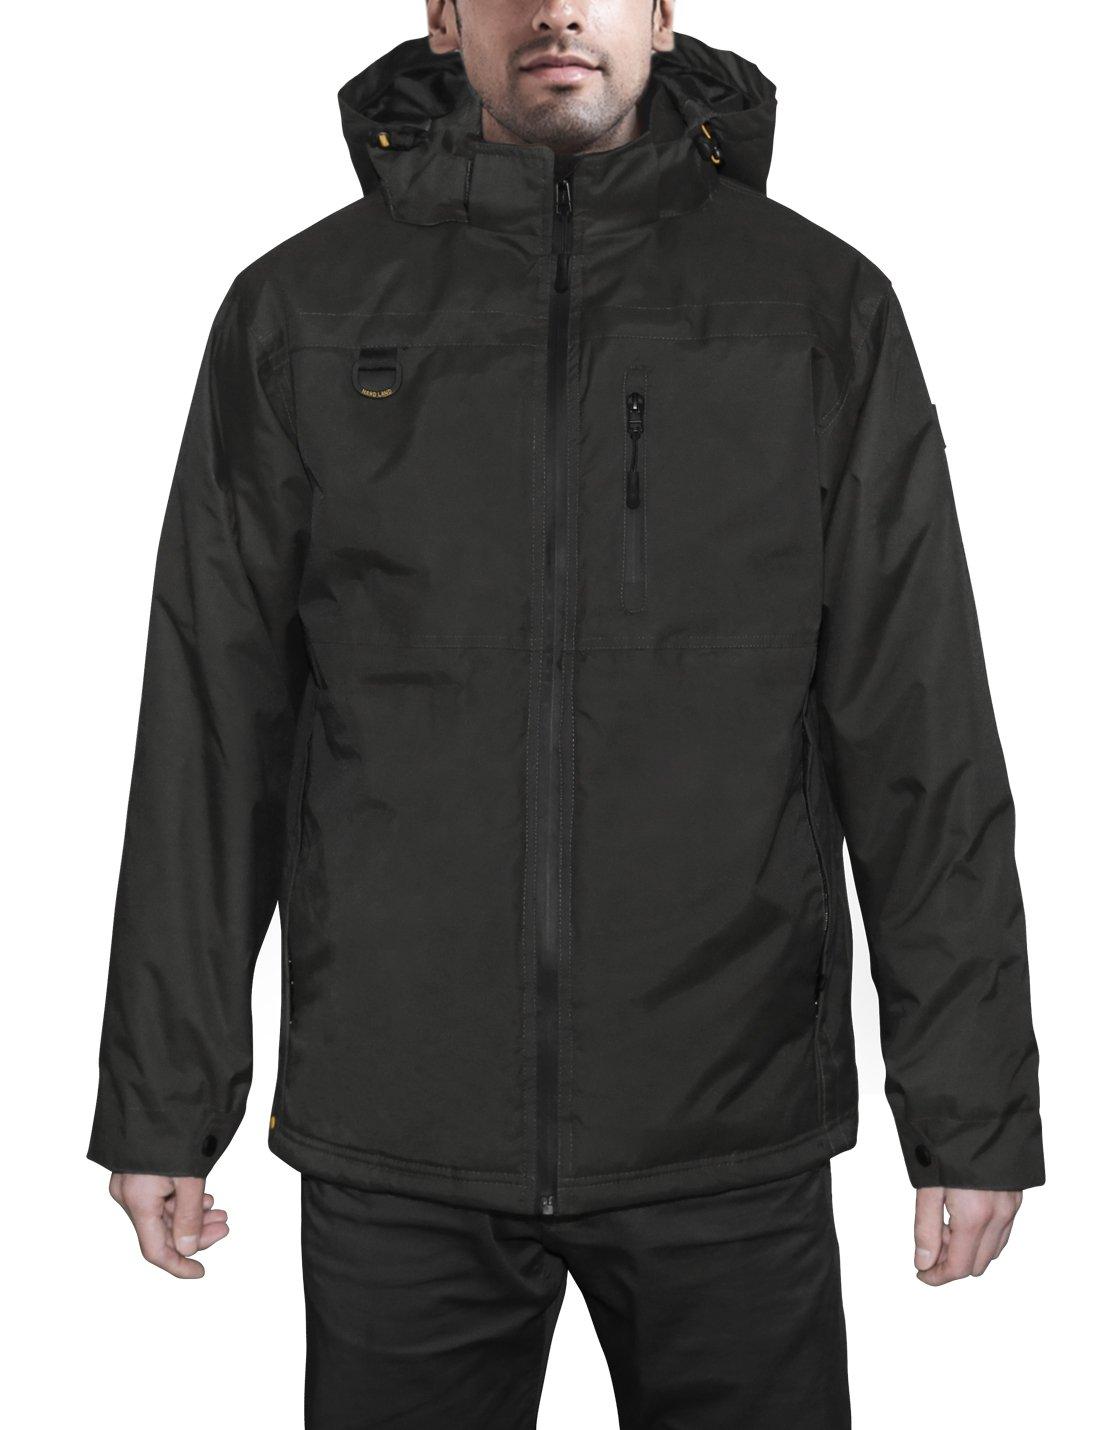 HARD LAND Mens Waterproof Down Parka Jacket Heavy Winter Coat Snowboard Jacket With Removable Hood Black Size XXXL